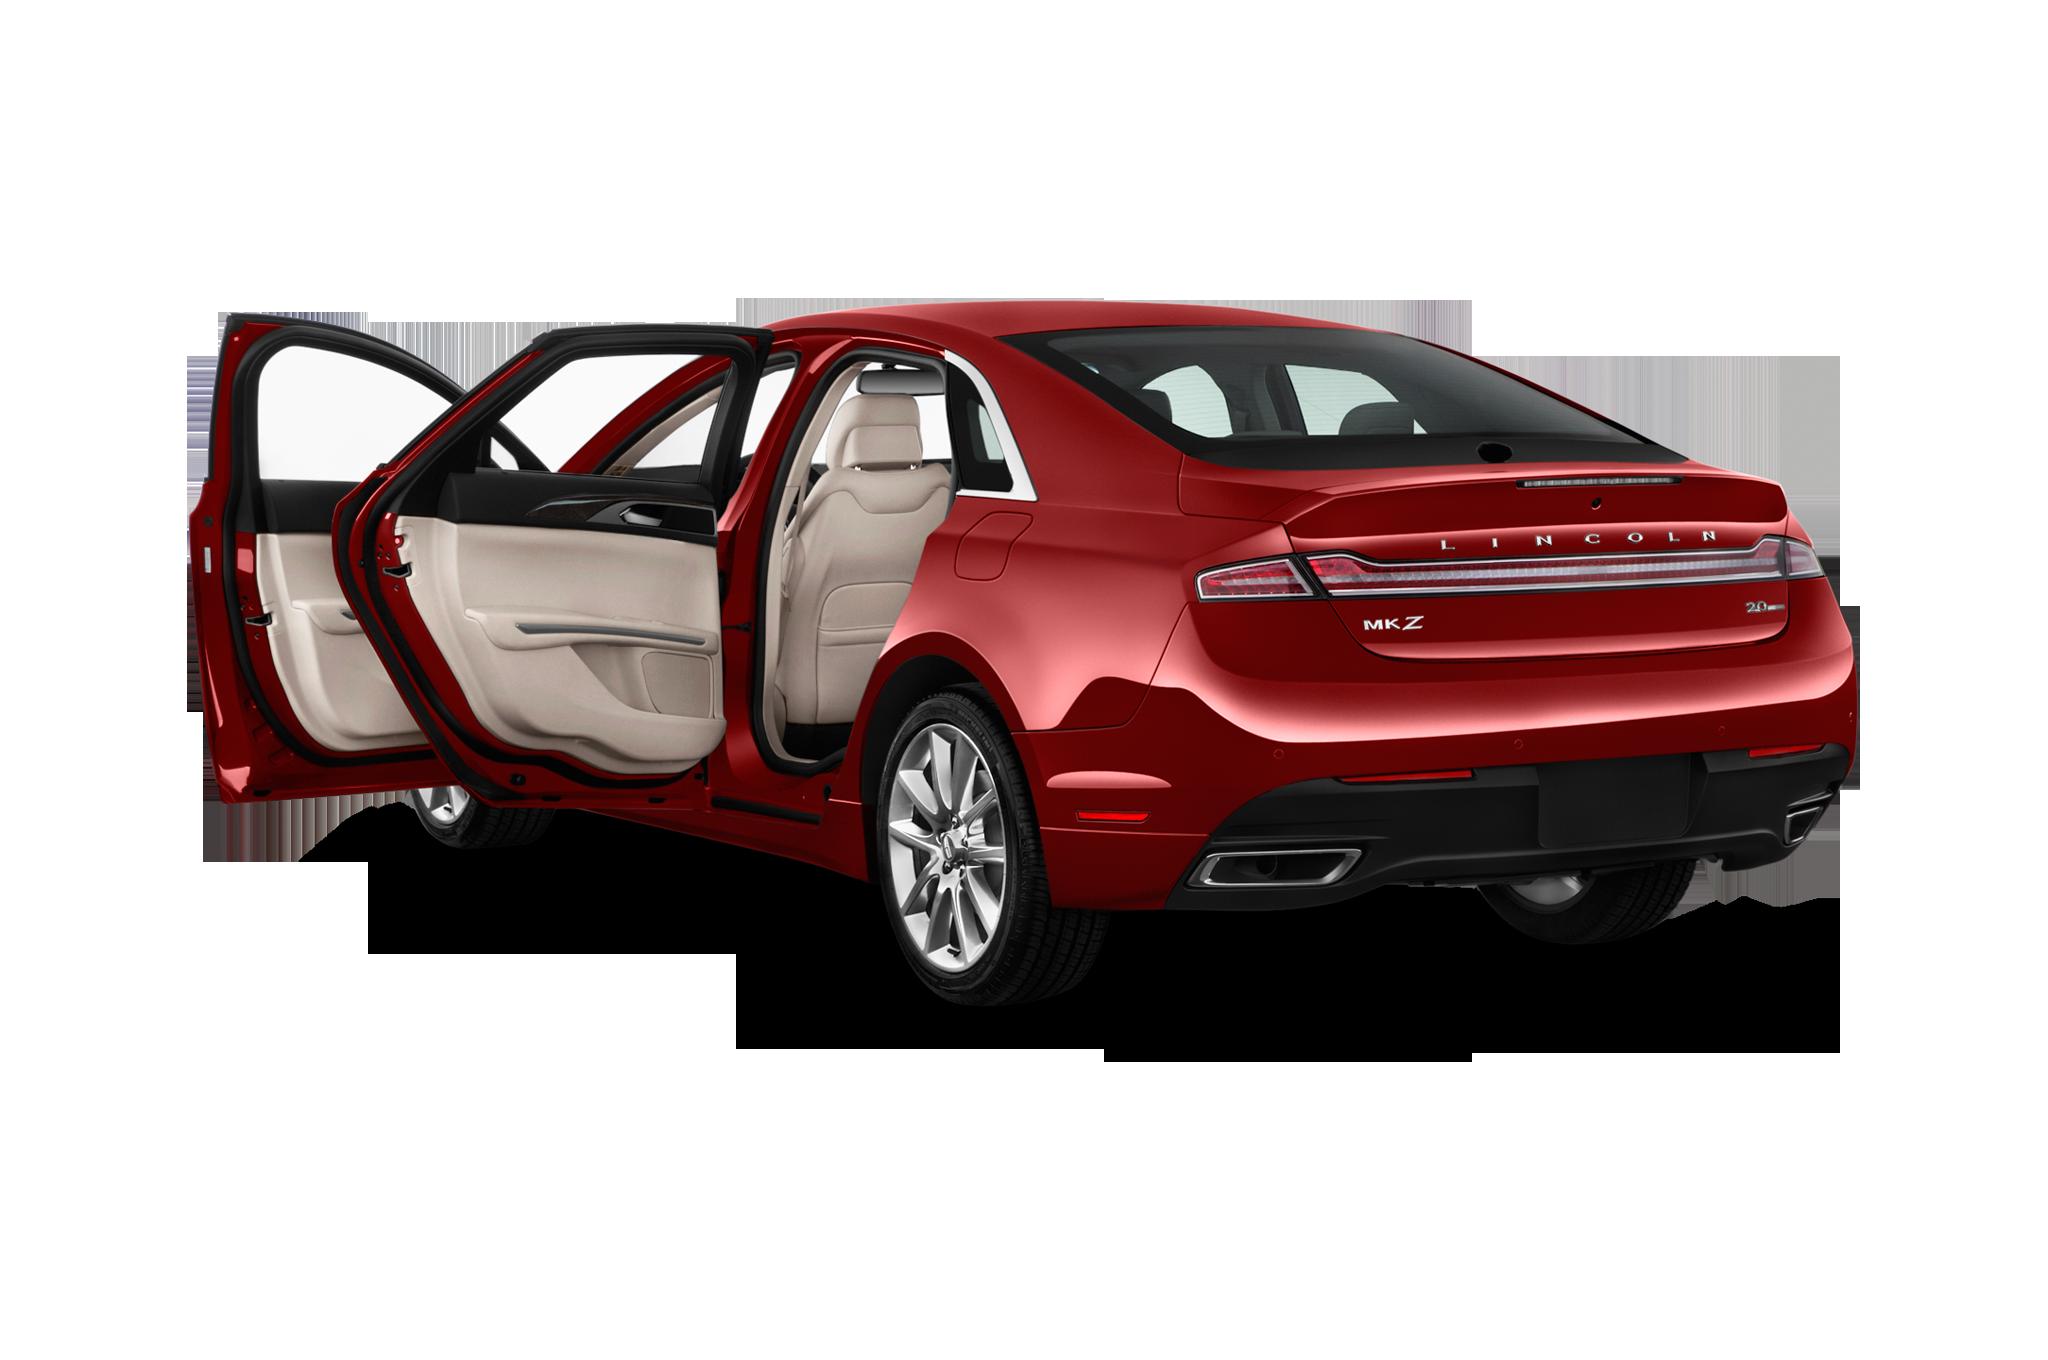 2017 lincoln mkz gains continental like face 400 hp v 6. Black Bedroom Furniture Sets. Home Design Ideas